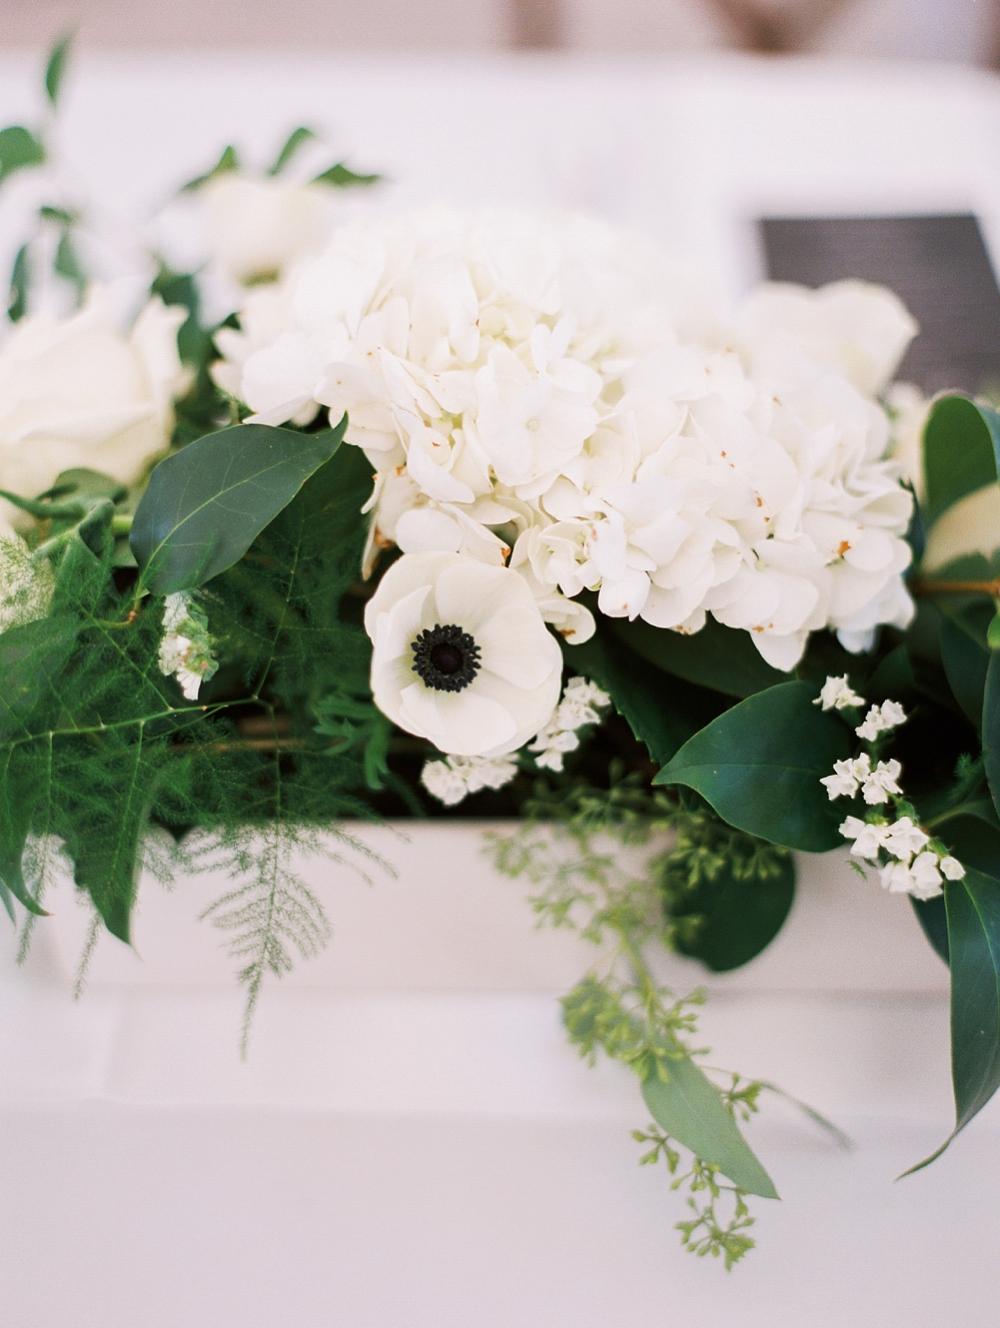 Kristin-La-Voie-Photography-austin-houston-texas-wedding-photographer-the-oaks-at-high-hill -150